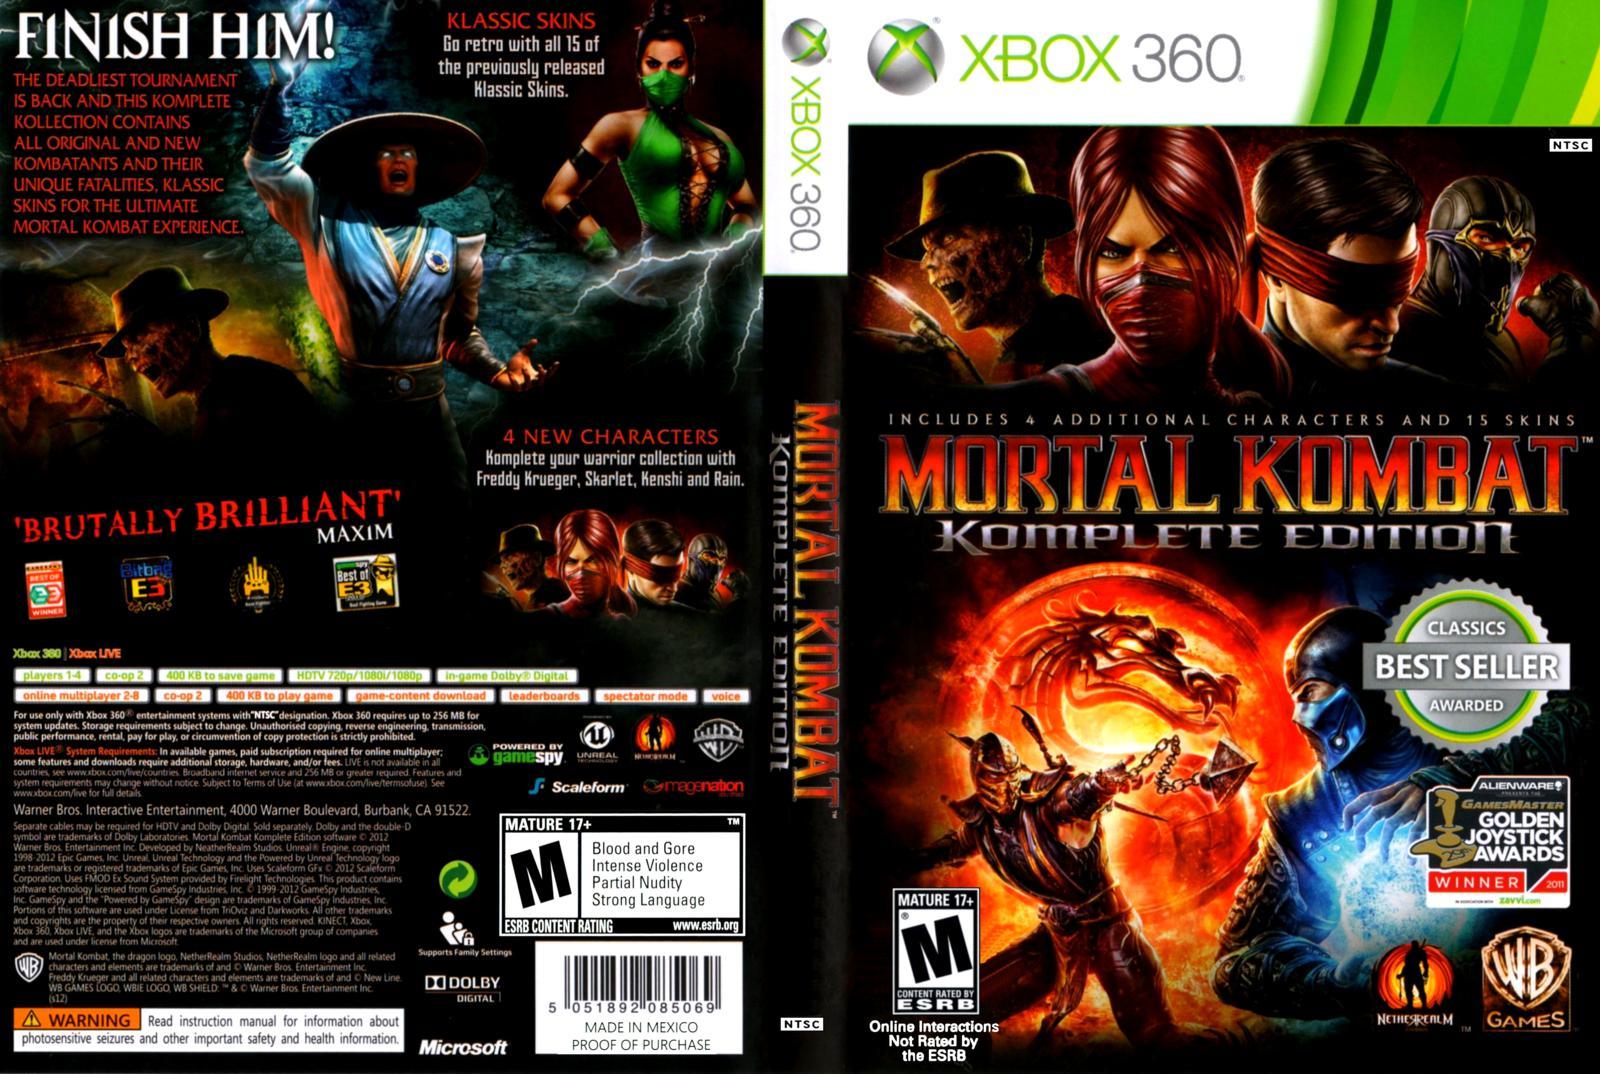 DAR Games: The 5 Greatest Mortal Kombat Games - DefineARevolution com